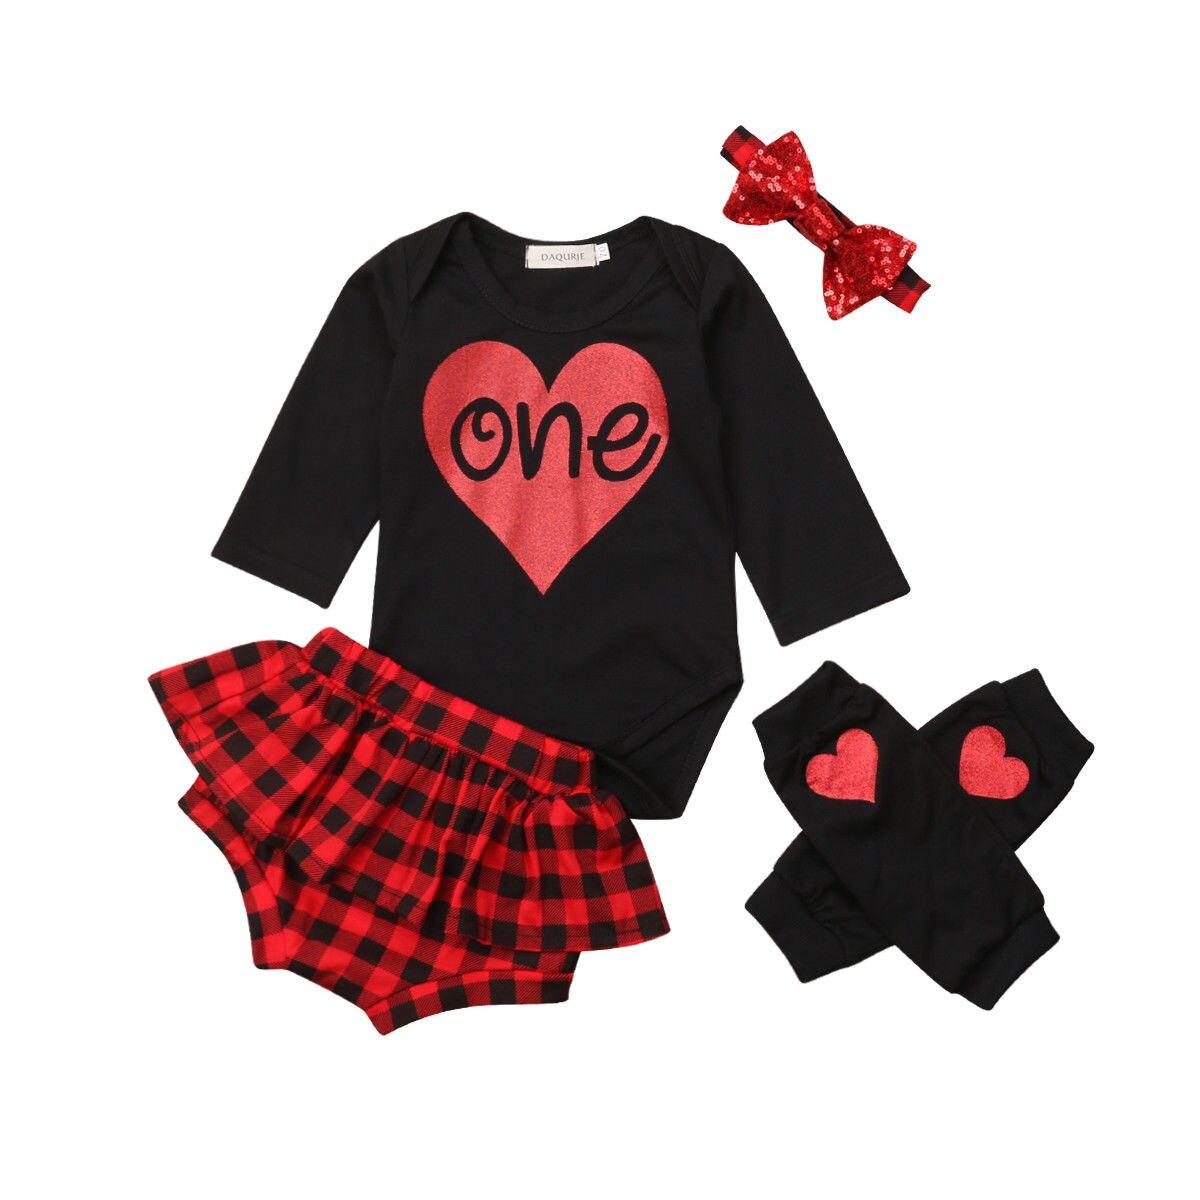 Infant Baby Girls Clothing Sets Outfits Cotton Romper+Plaid Shorts Pants Warm Leg 4PCS Cute Baby Girl Clothes Set